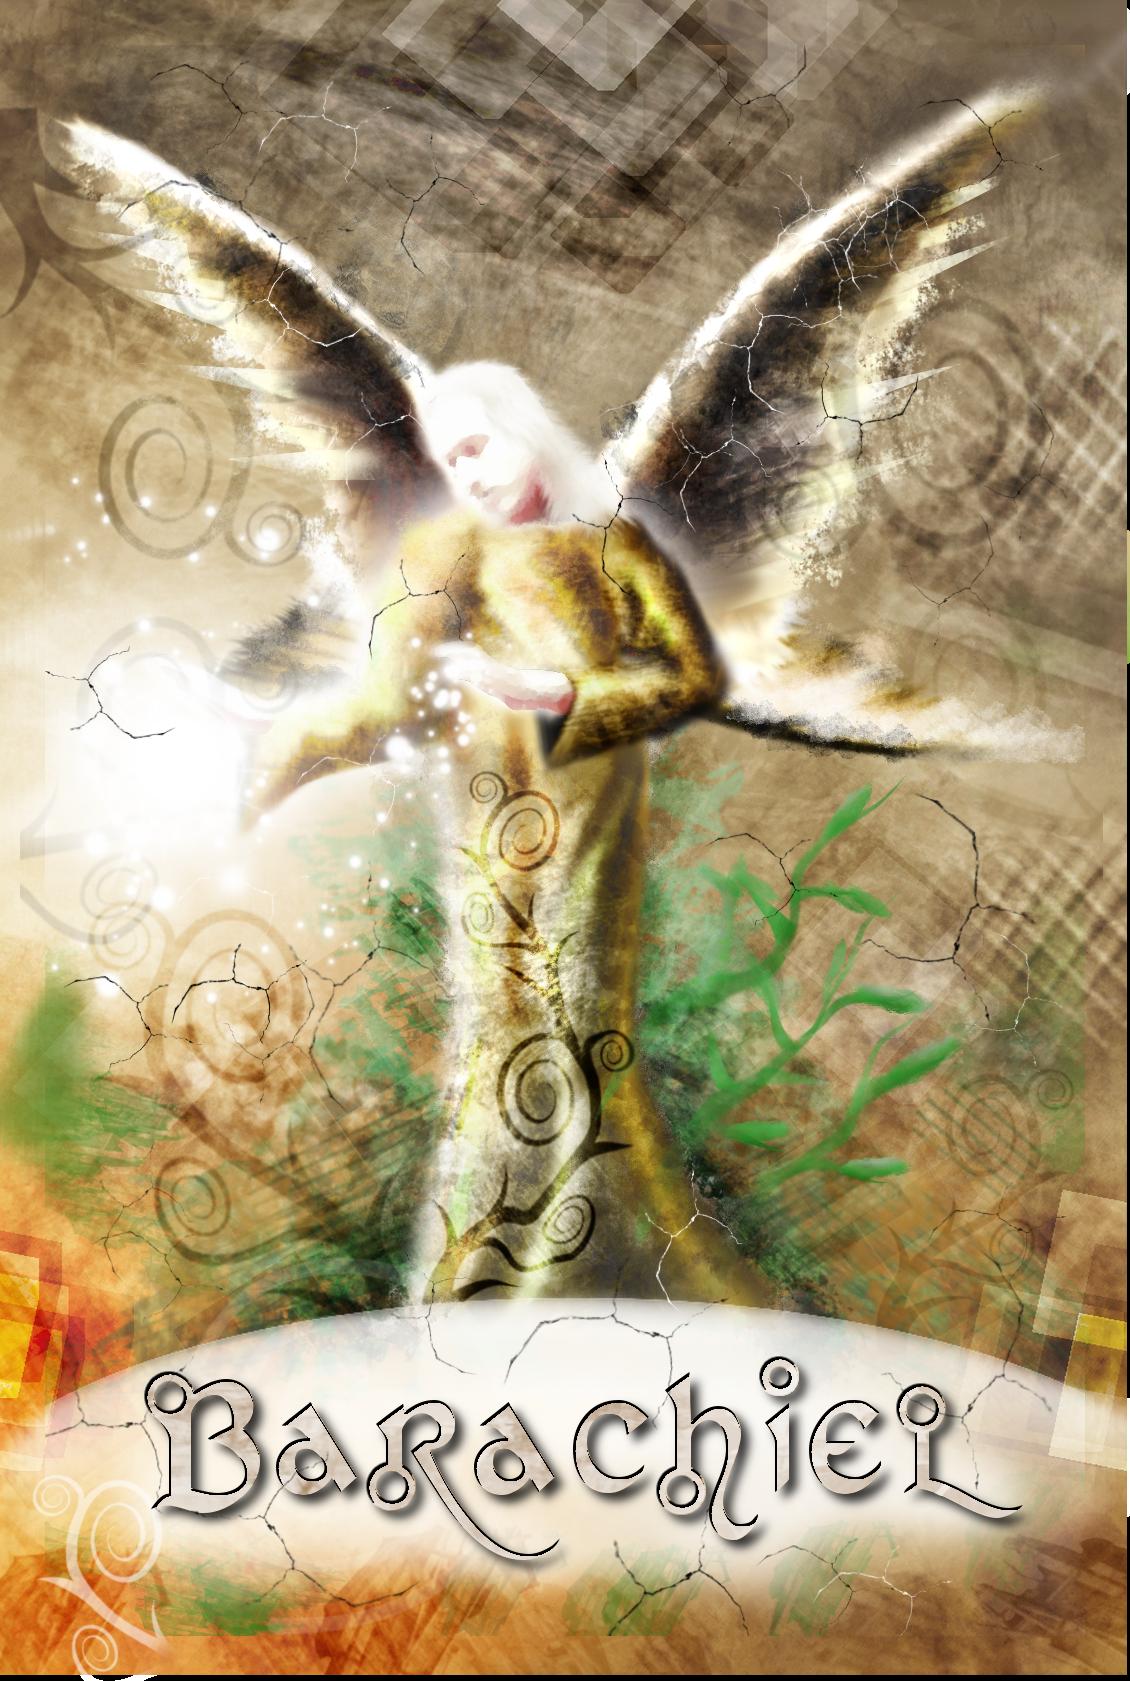 Engelkarte Barachiel